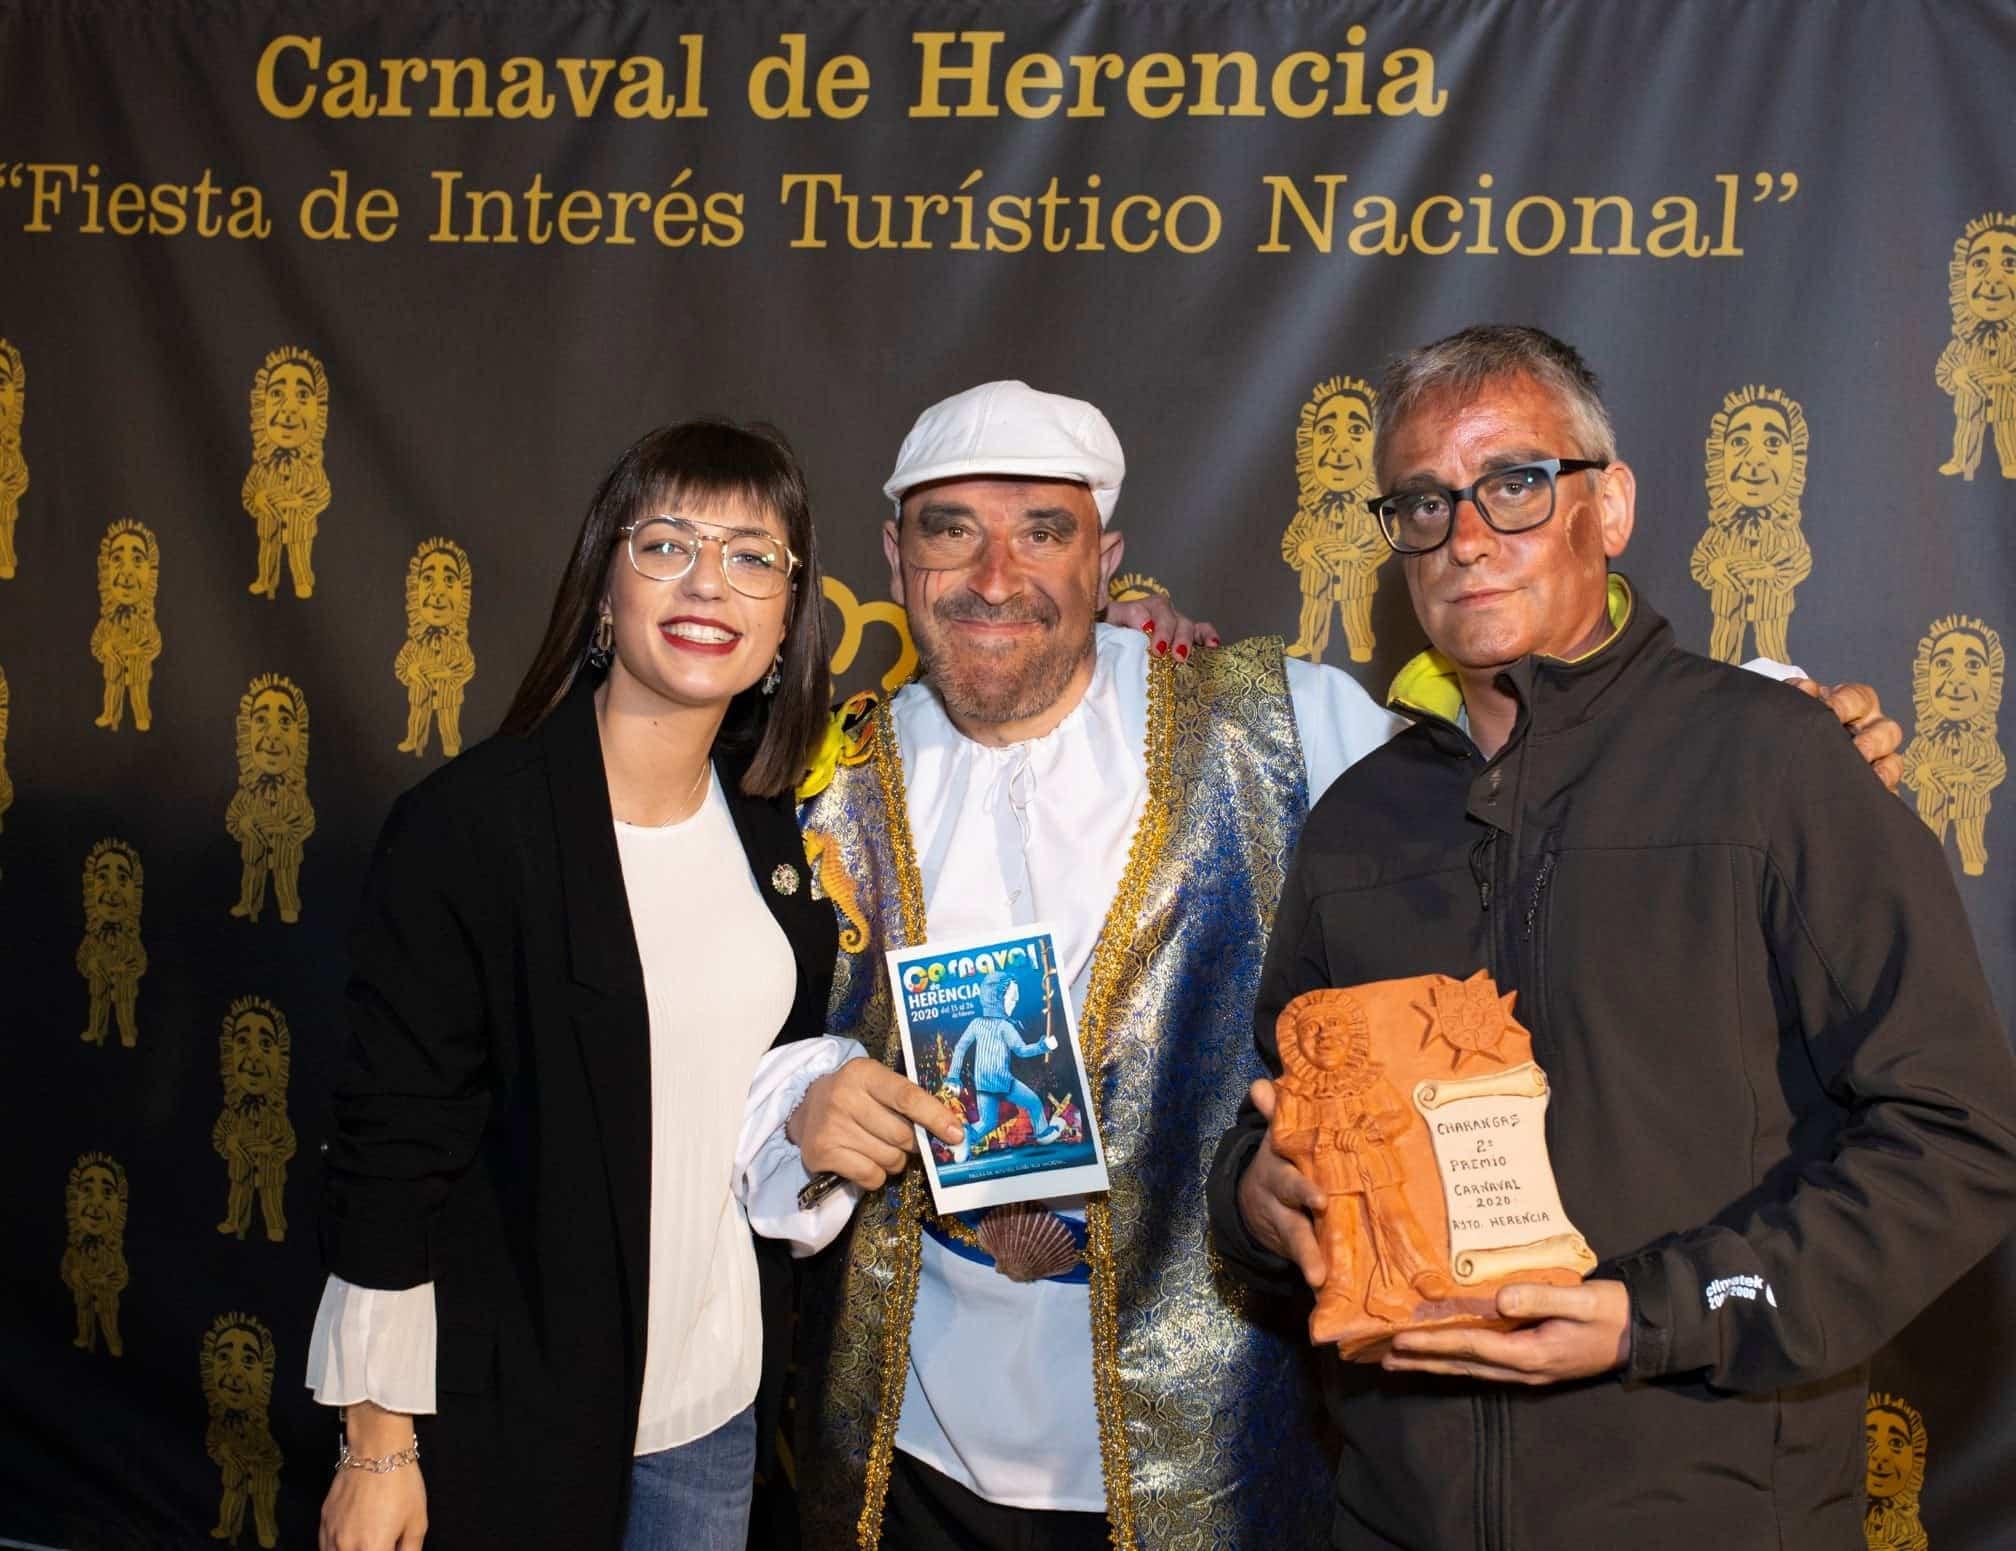 Carnaval de herencia 2020 ofertorio 61 - Selección de fotografías del Ofertorio del Carnaval de Herencia